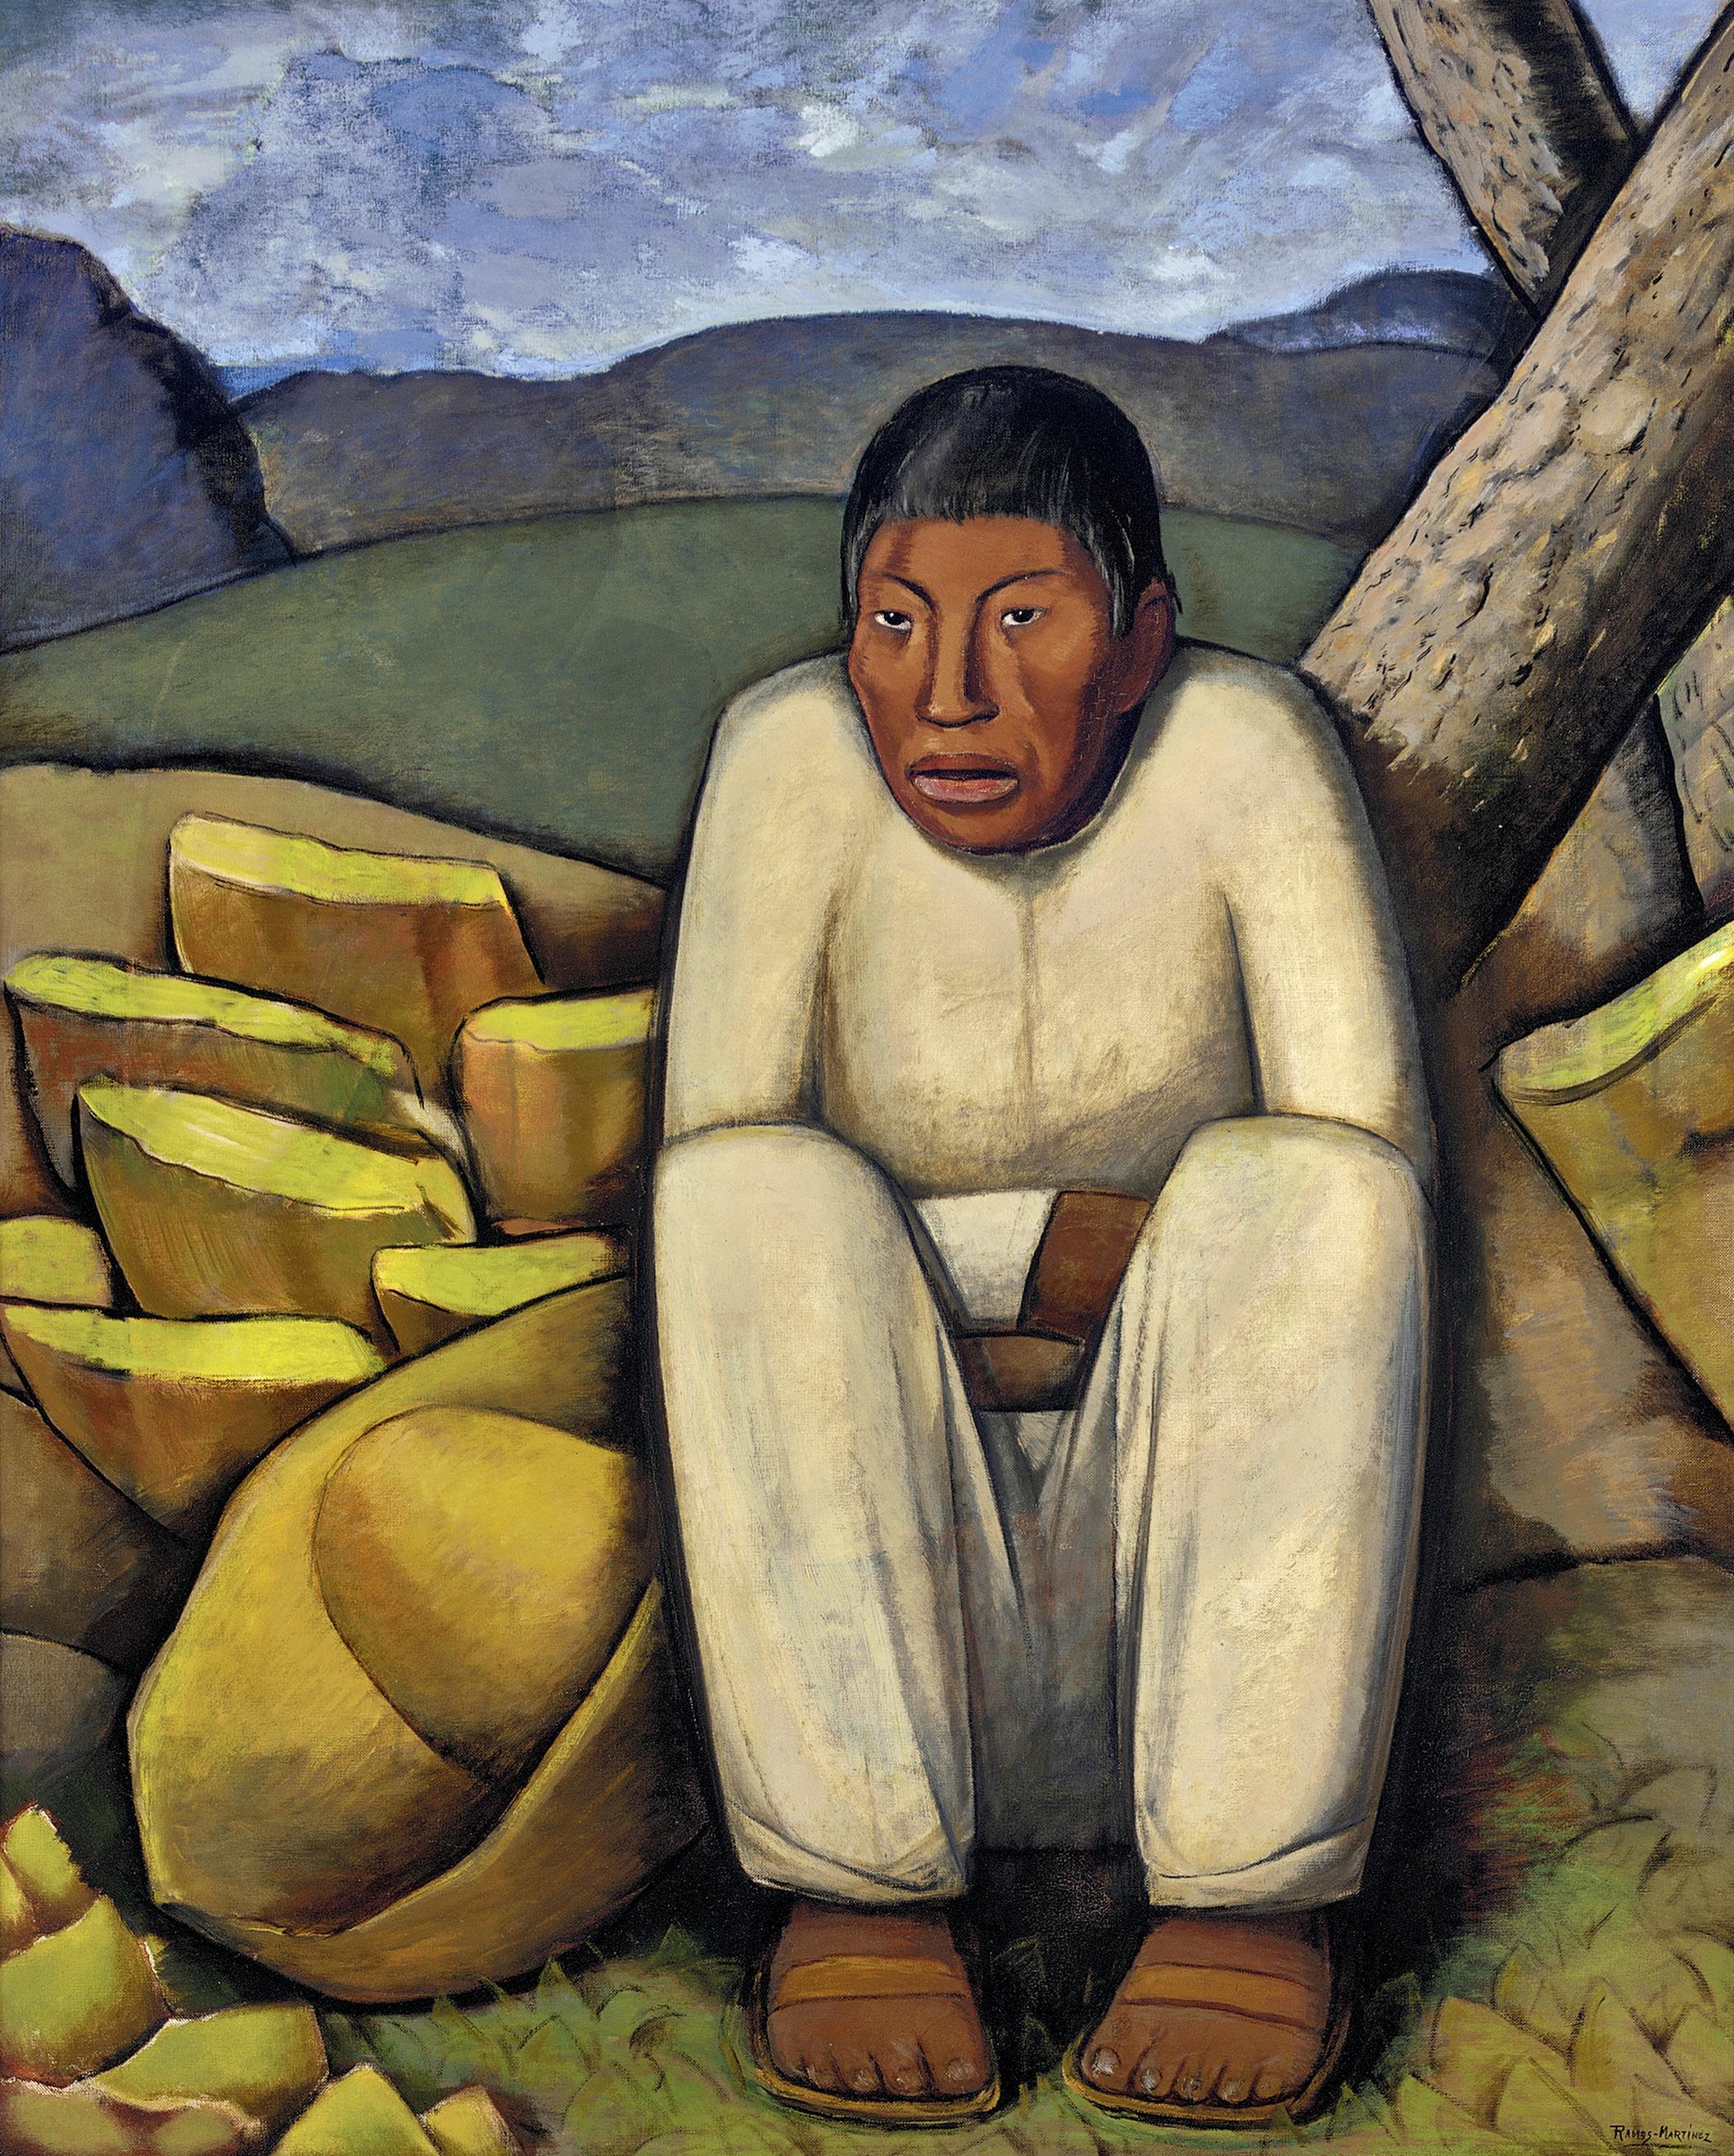 El Indio Solitario / Lonesome Indian  ca. 1933 oil on canvas / óleo sobre tela 44.5 x 36.3 inches; 113 x 92.1 centímetros Private collection